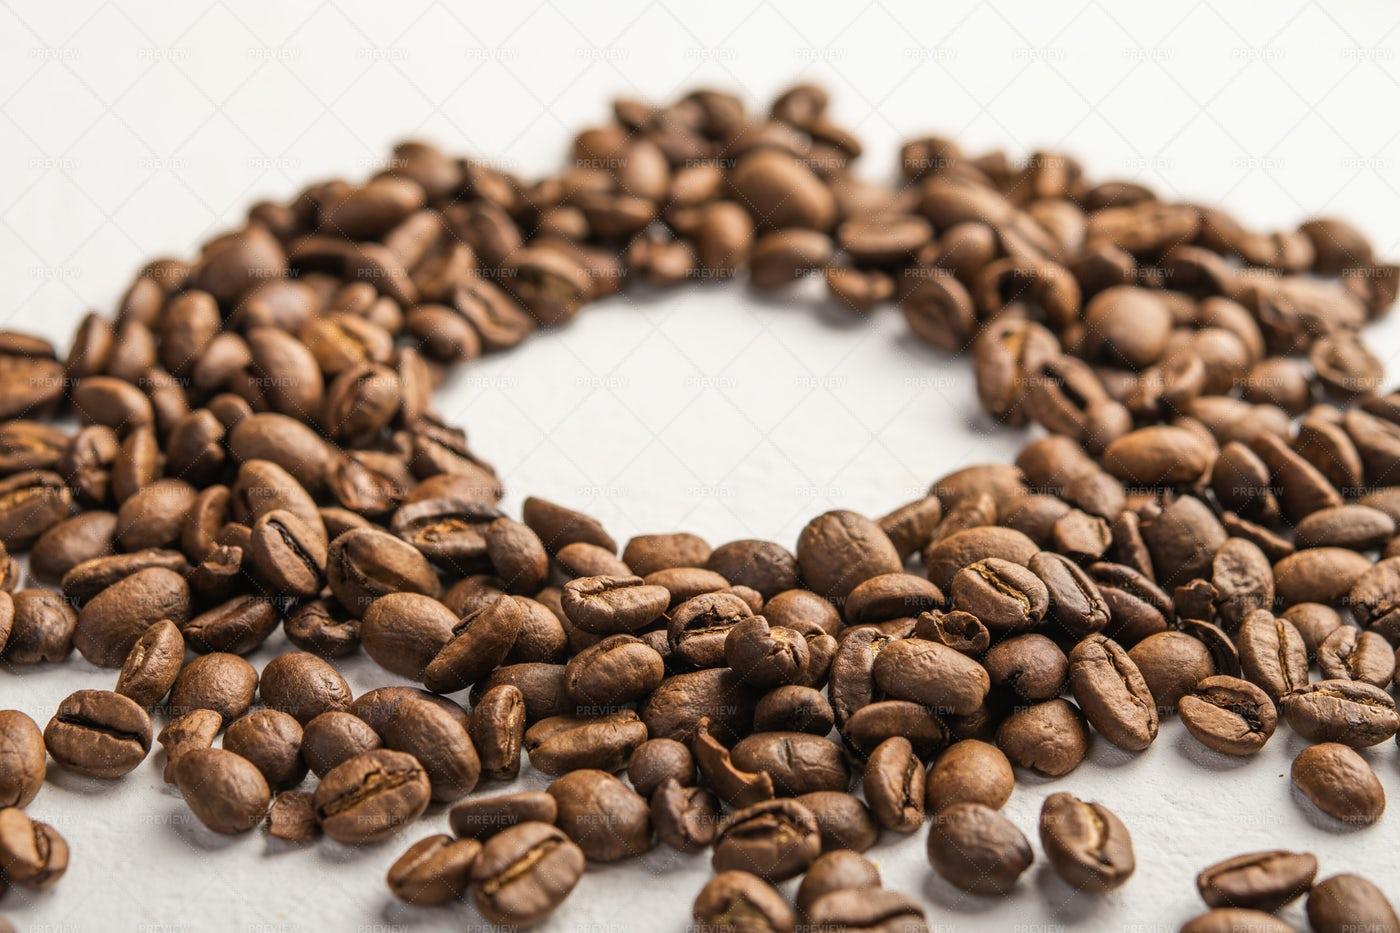 Coffee Beans In A Circle: Stock Photos